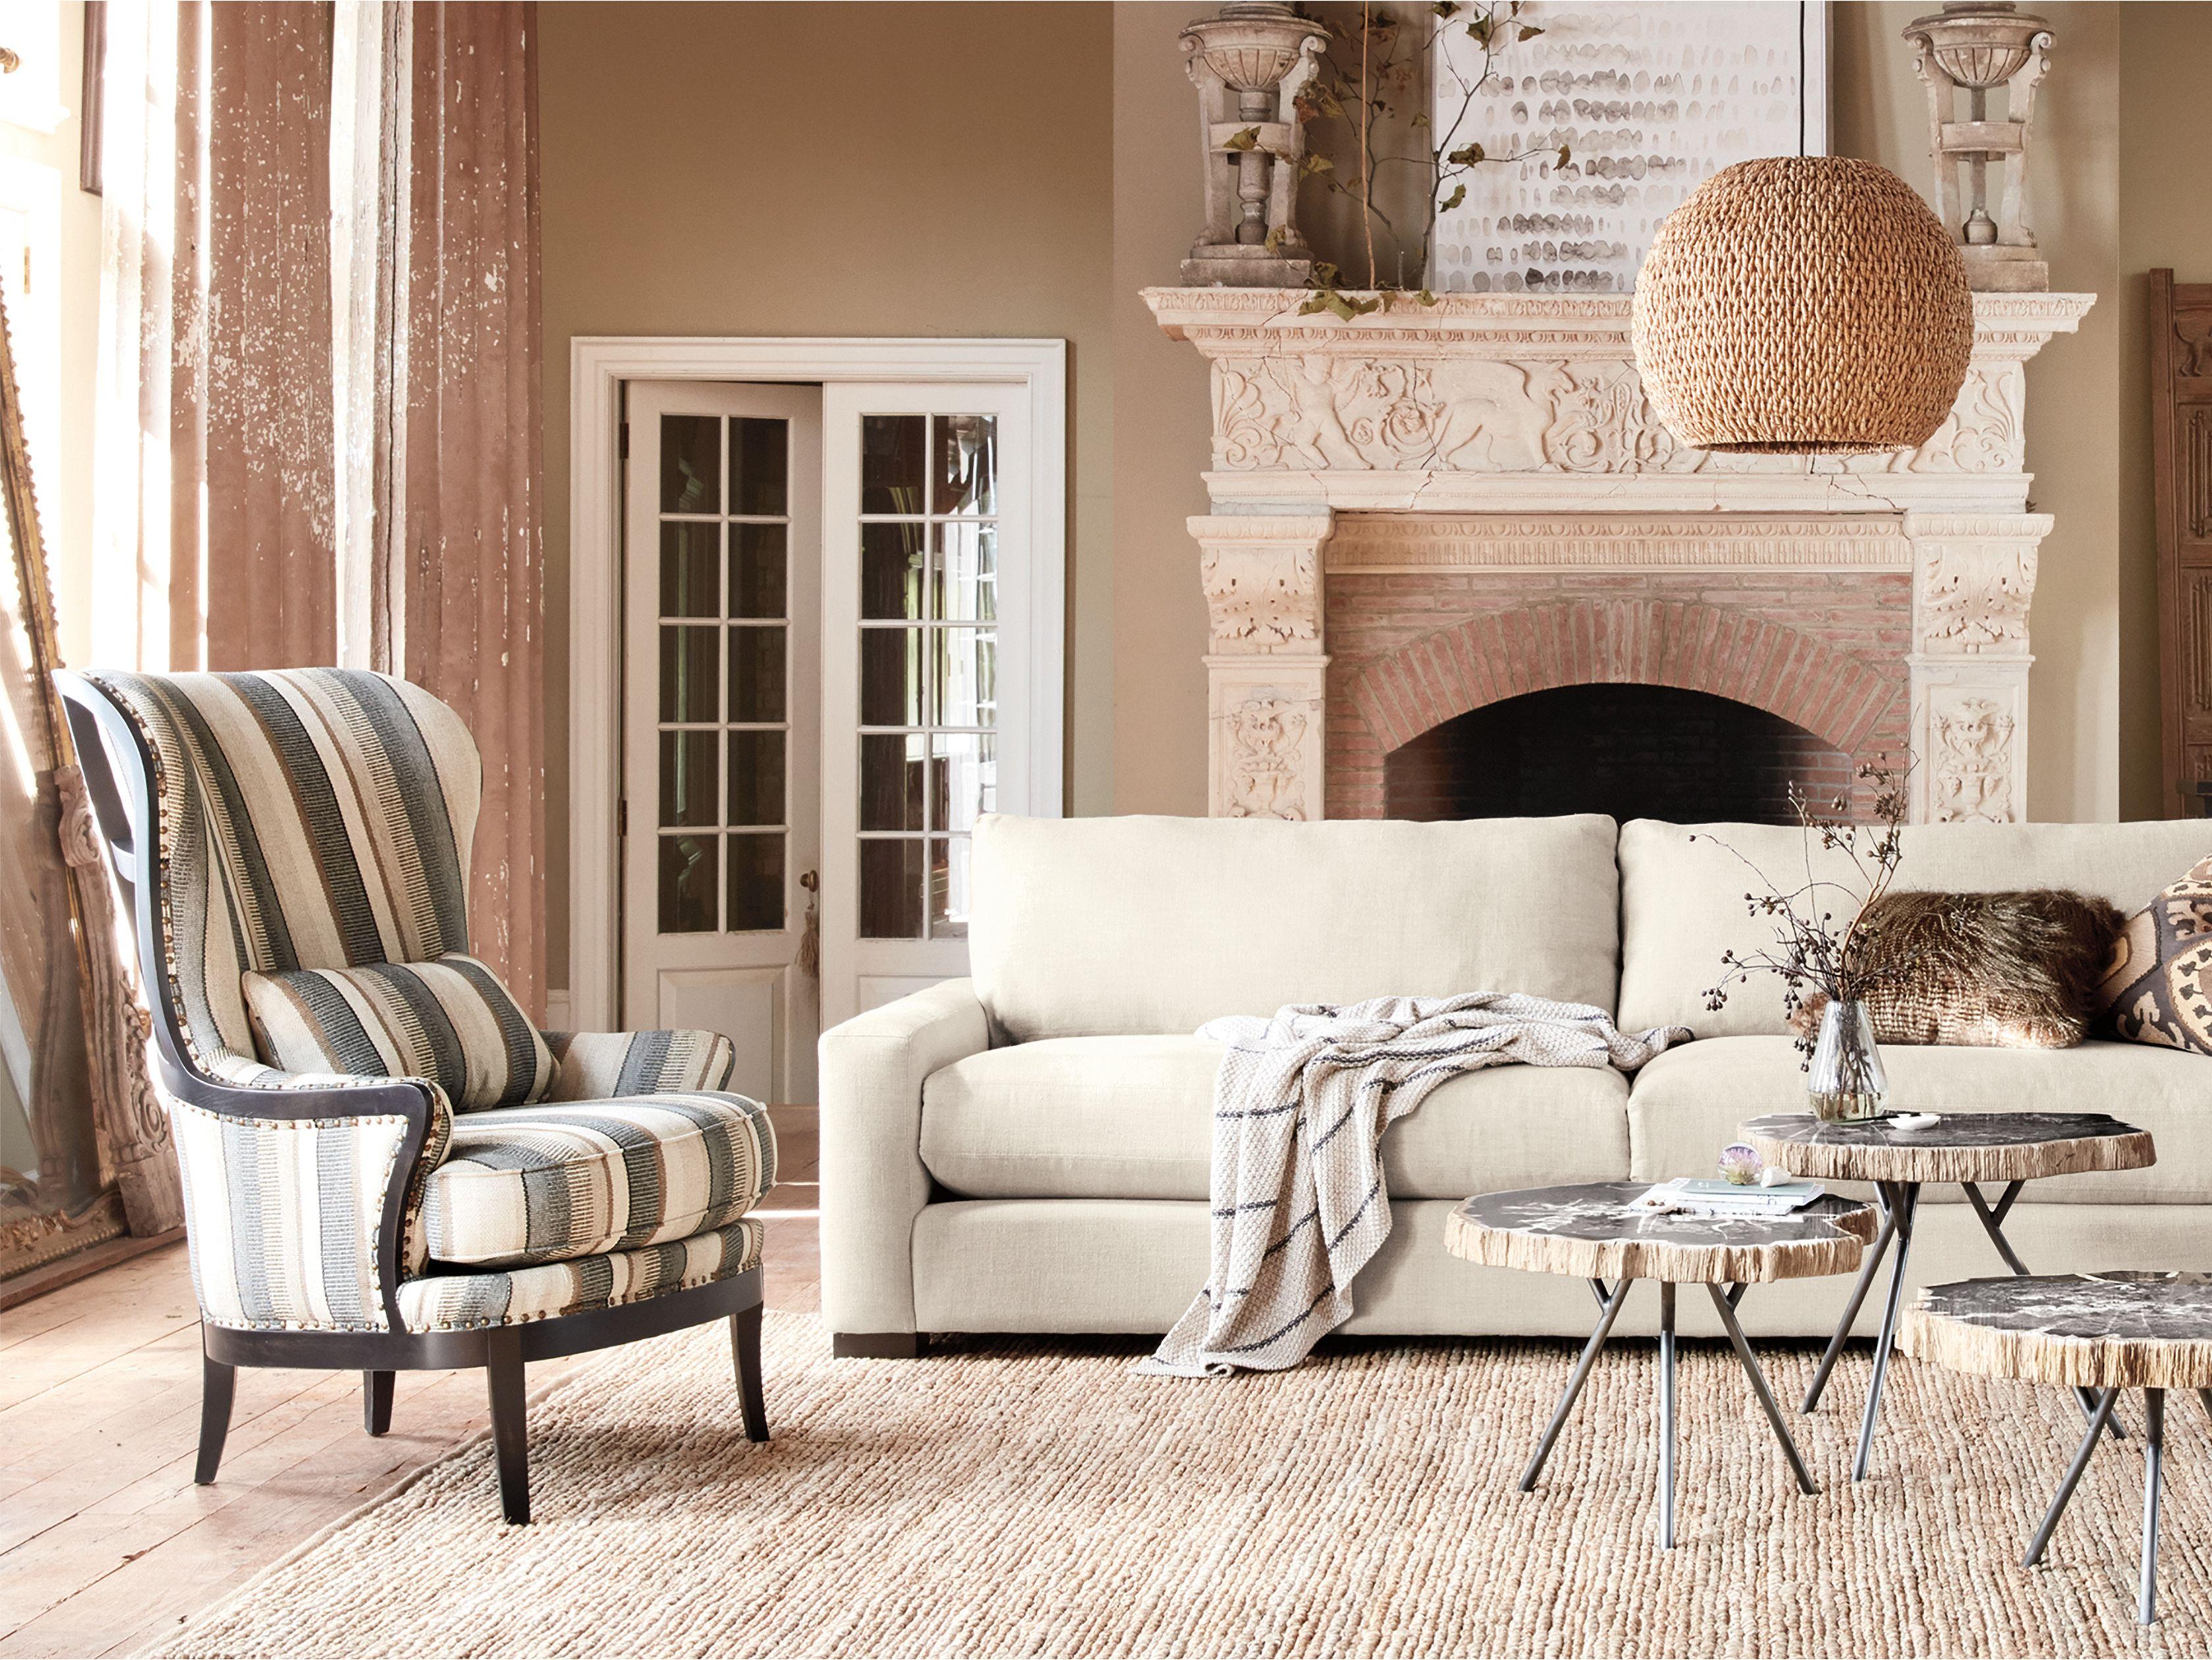 Portsmouth Chair Arhaus Furniture Living Room Sets Furniture Arhaus Living Room Pretty Living Room